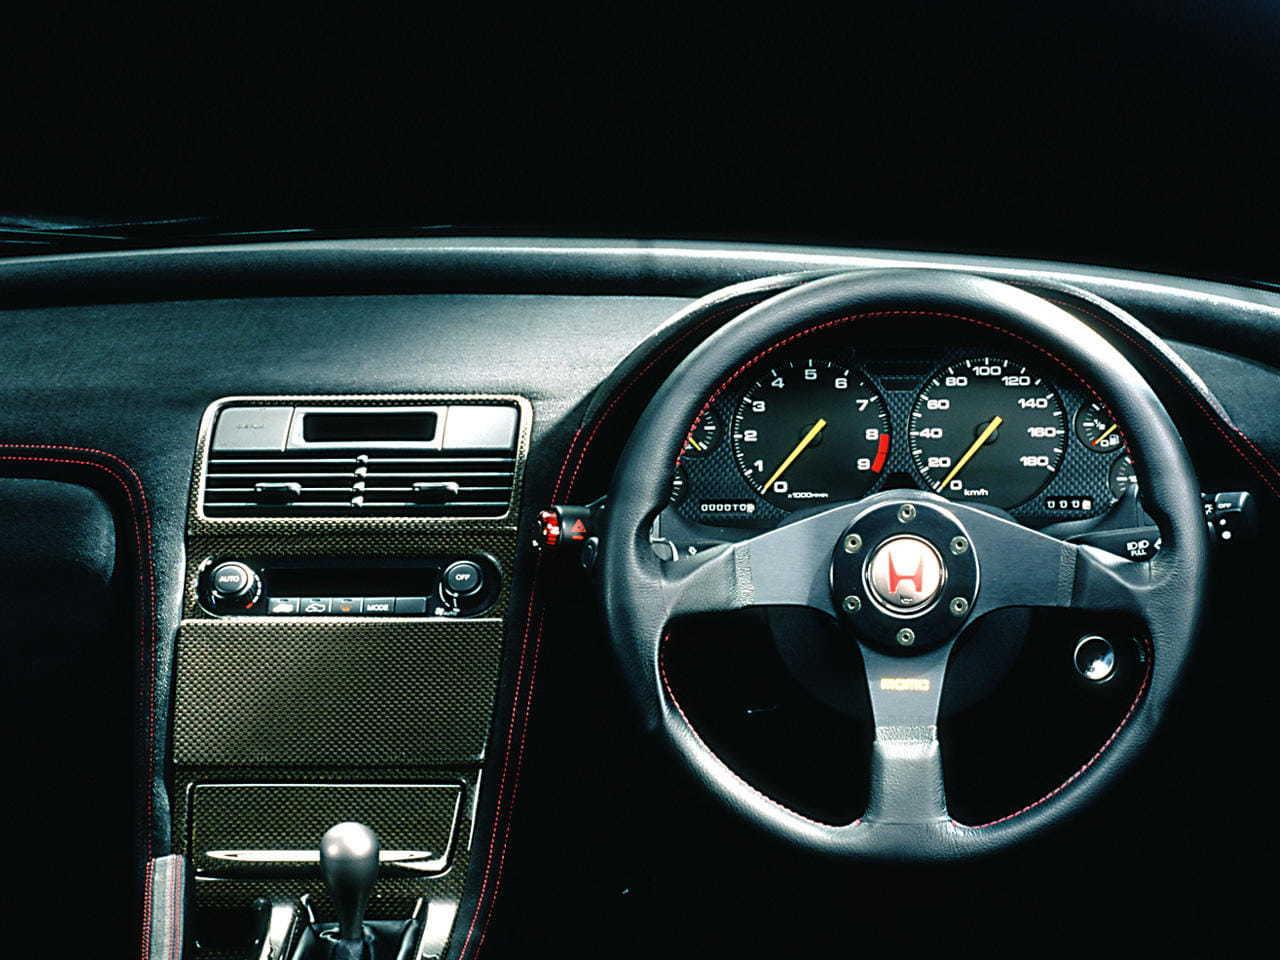 Honda Nsx Limitador 180 Kmh